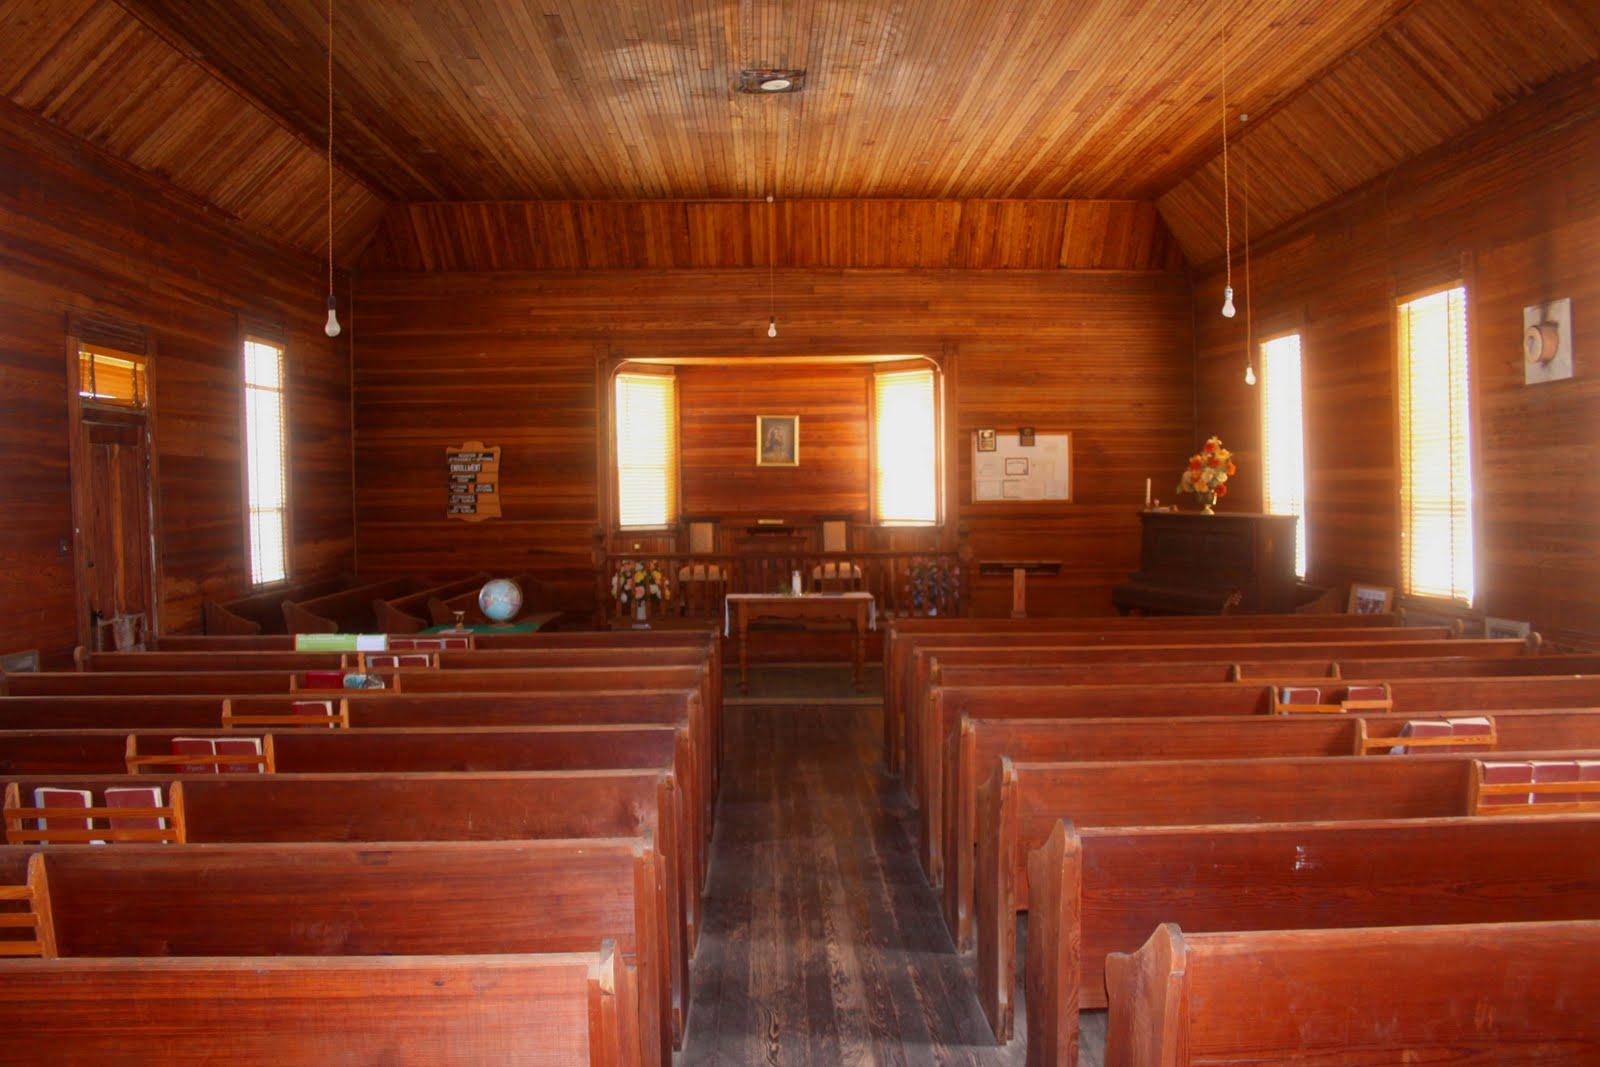 CARTERS CHAPEL METHODIST CHURCH SCOTT GEORGIA